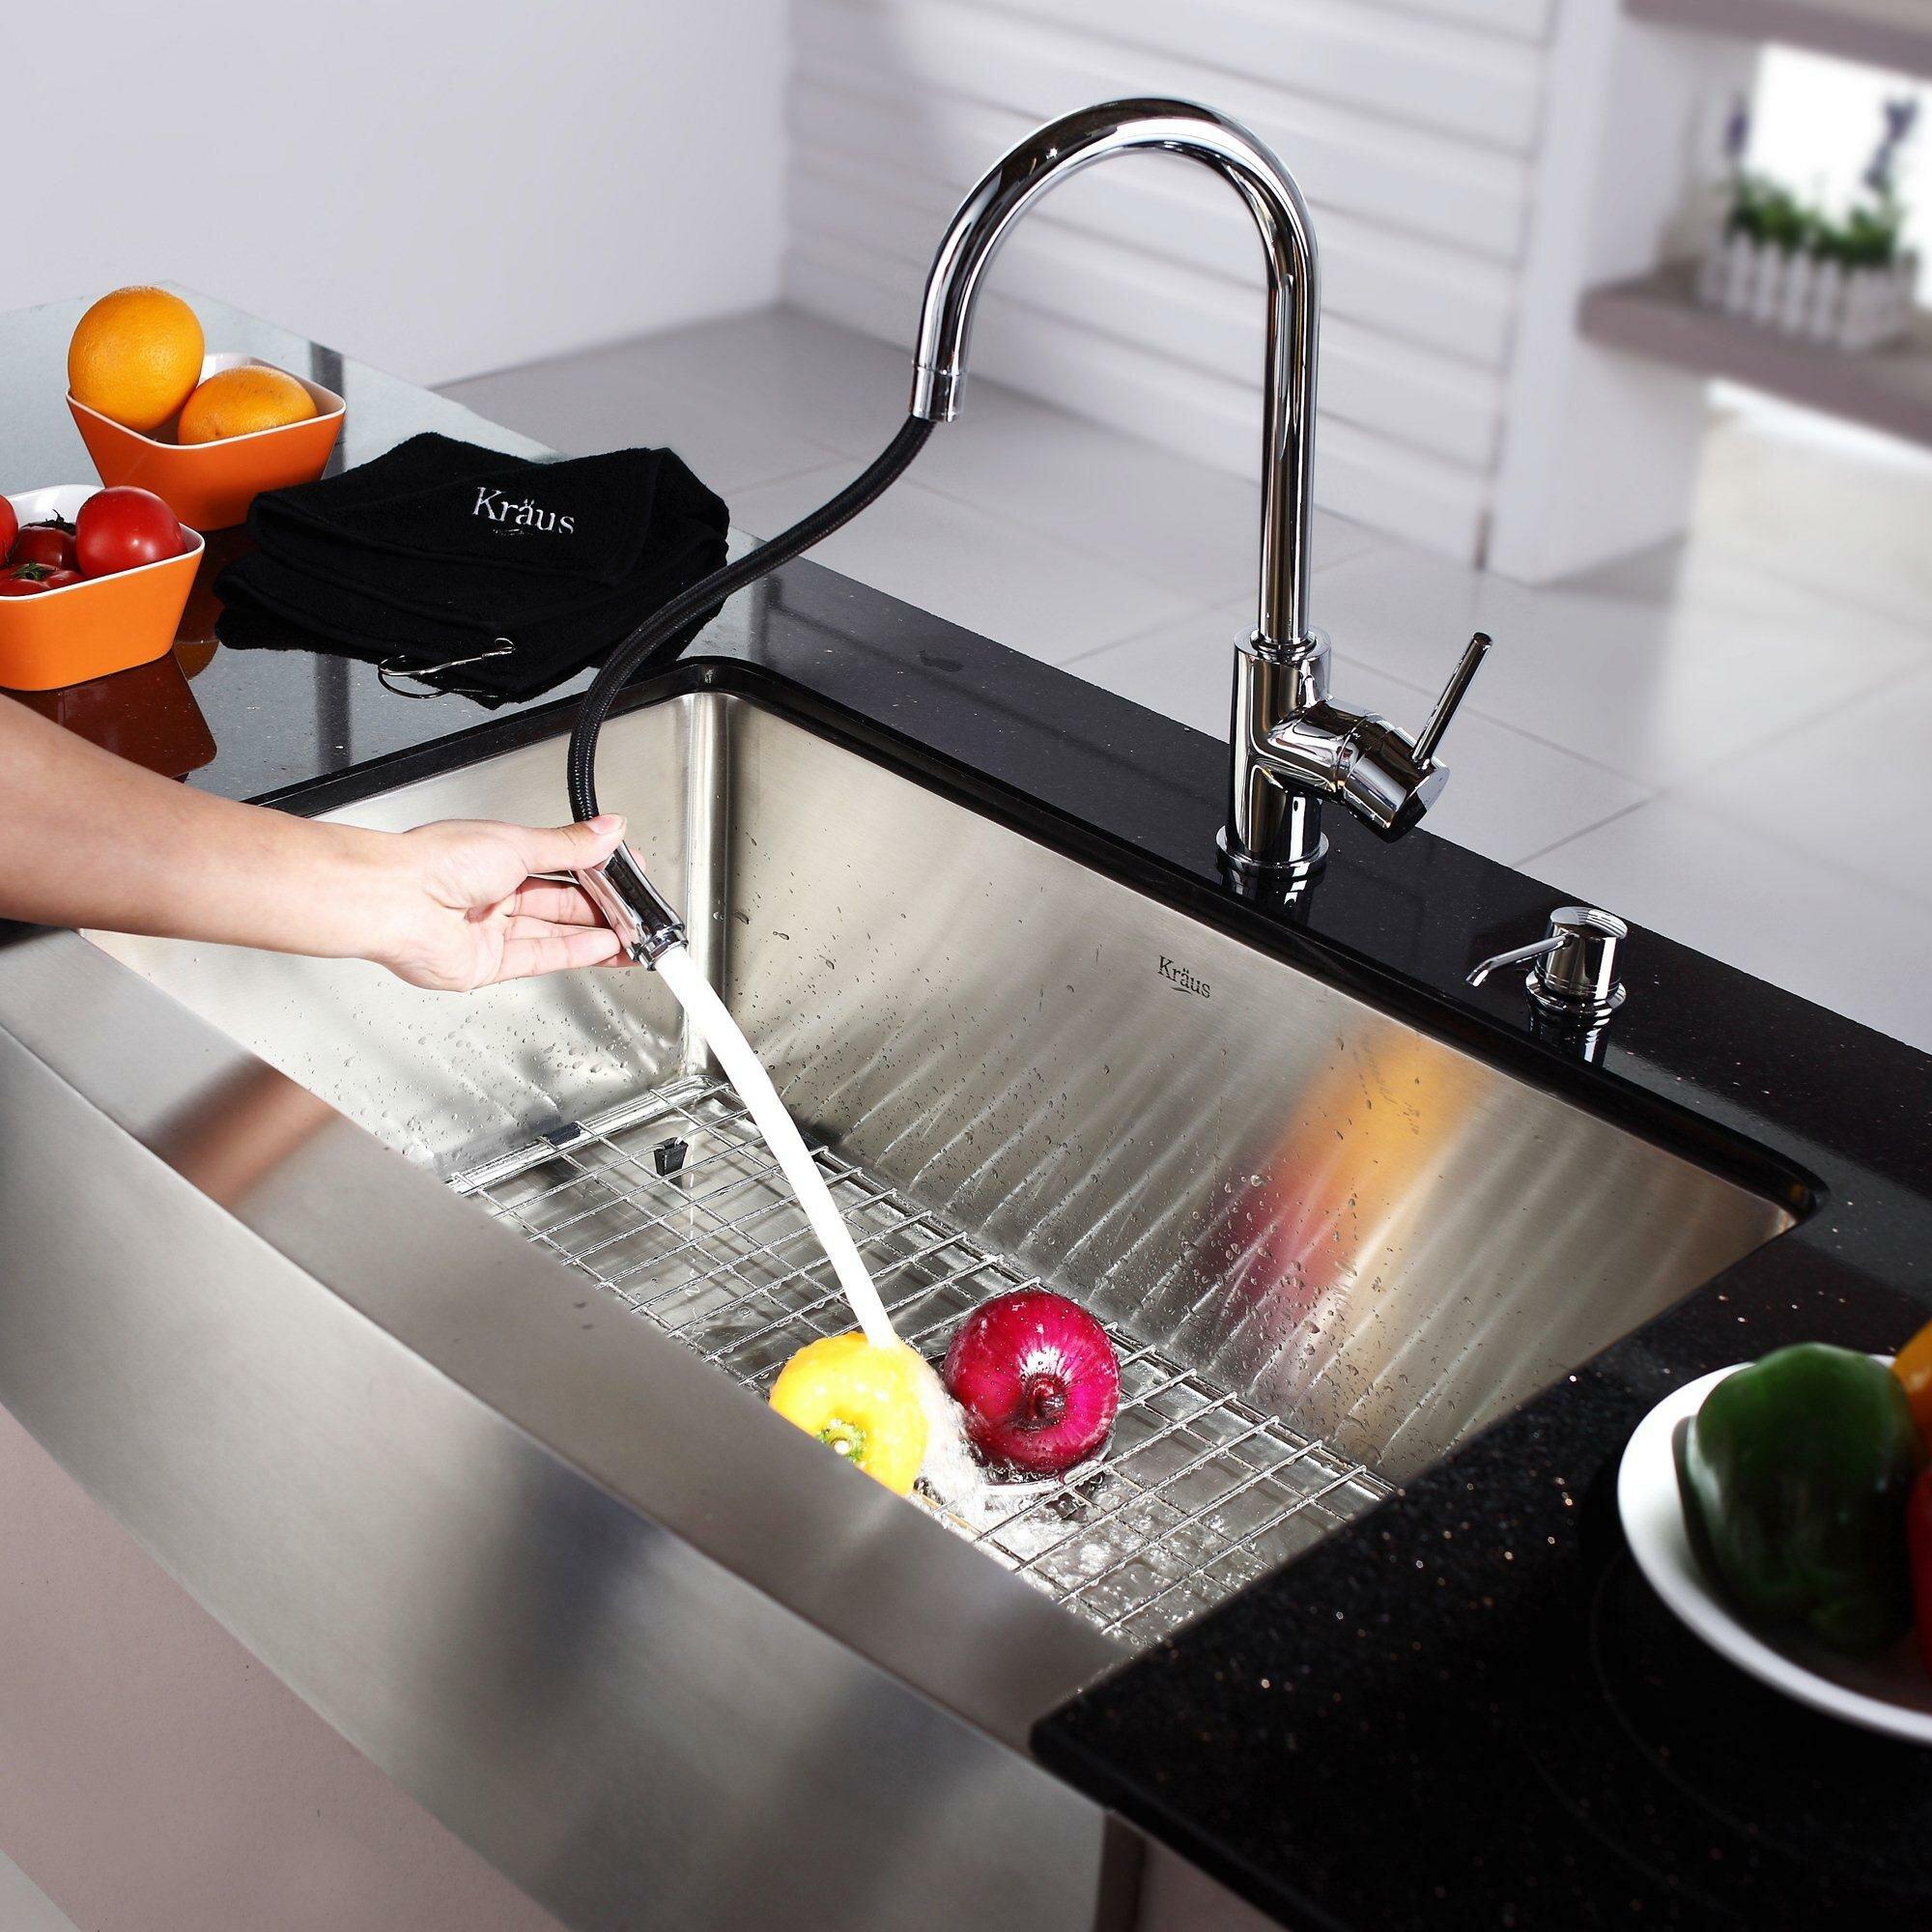 kraus x 20 farmhouse kitchen sink with faucet and soap dispenser reviews wayfair. Black Bedroom Furniture Sets. Home Design Ideas